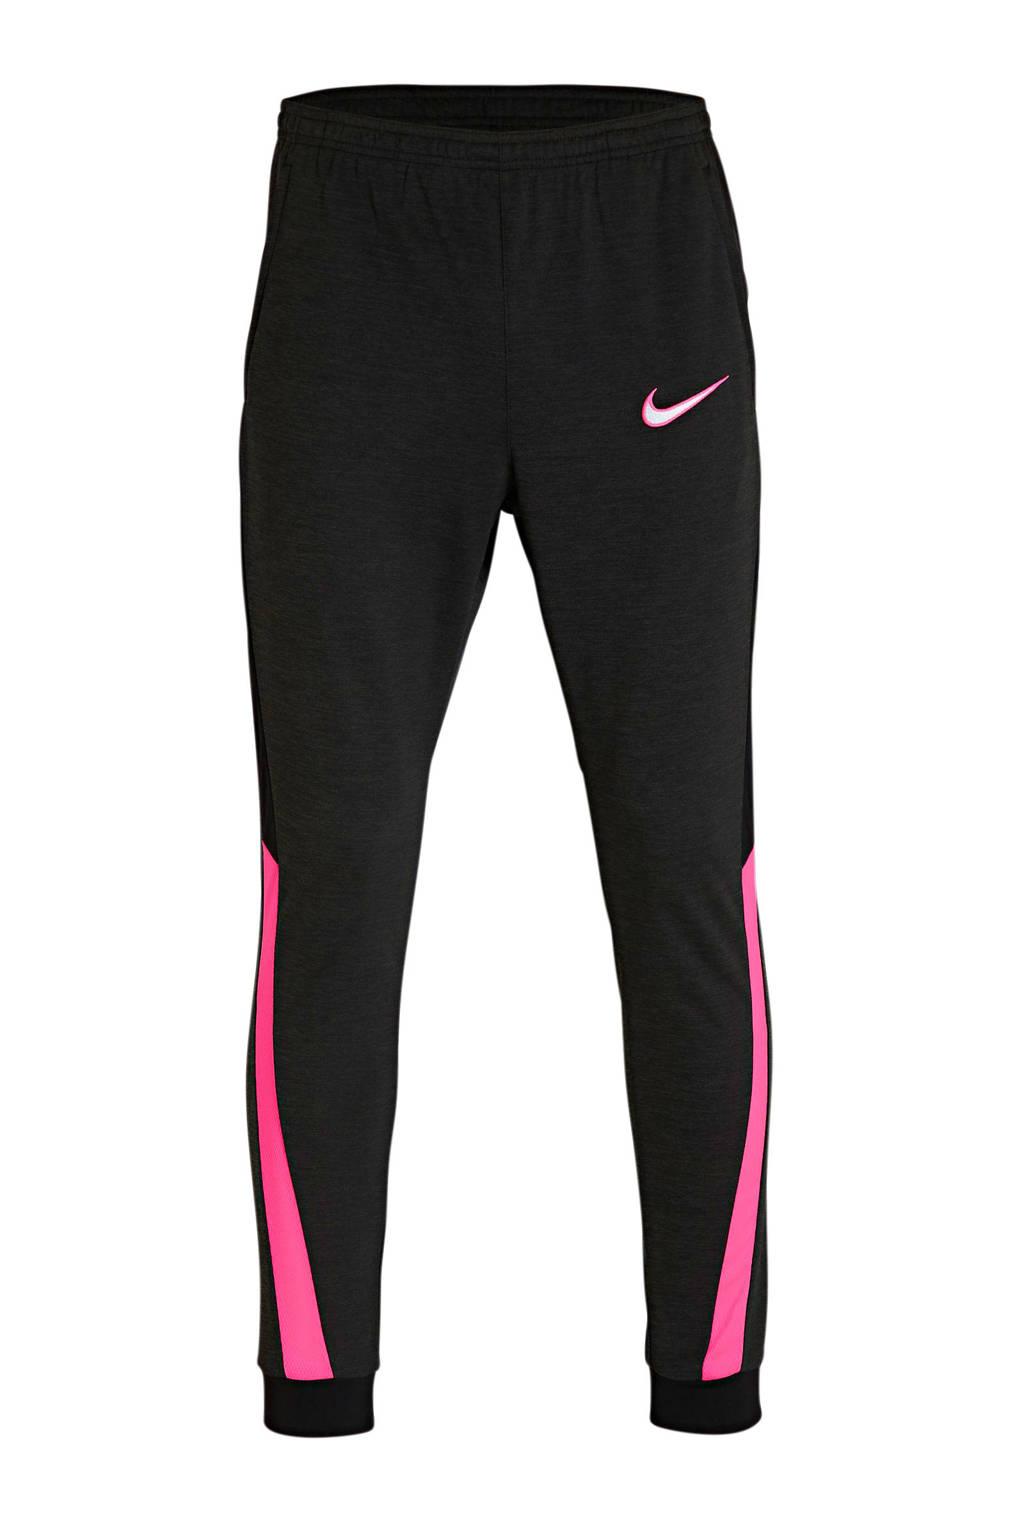 Nike Senior  Academy voetbalbroek zwart/roze, Zwart/roze